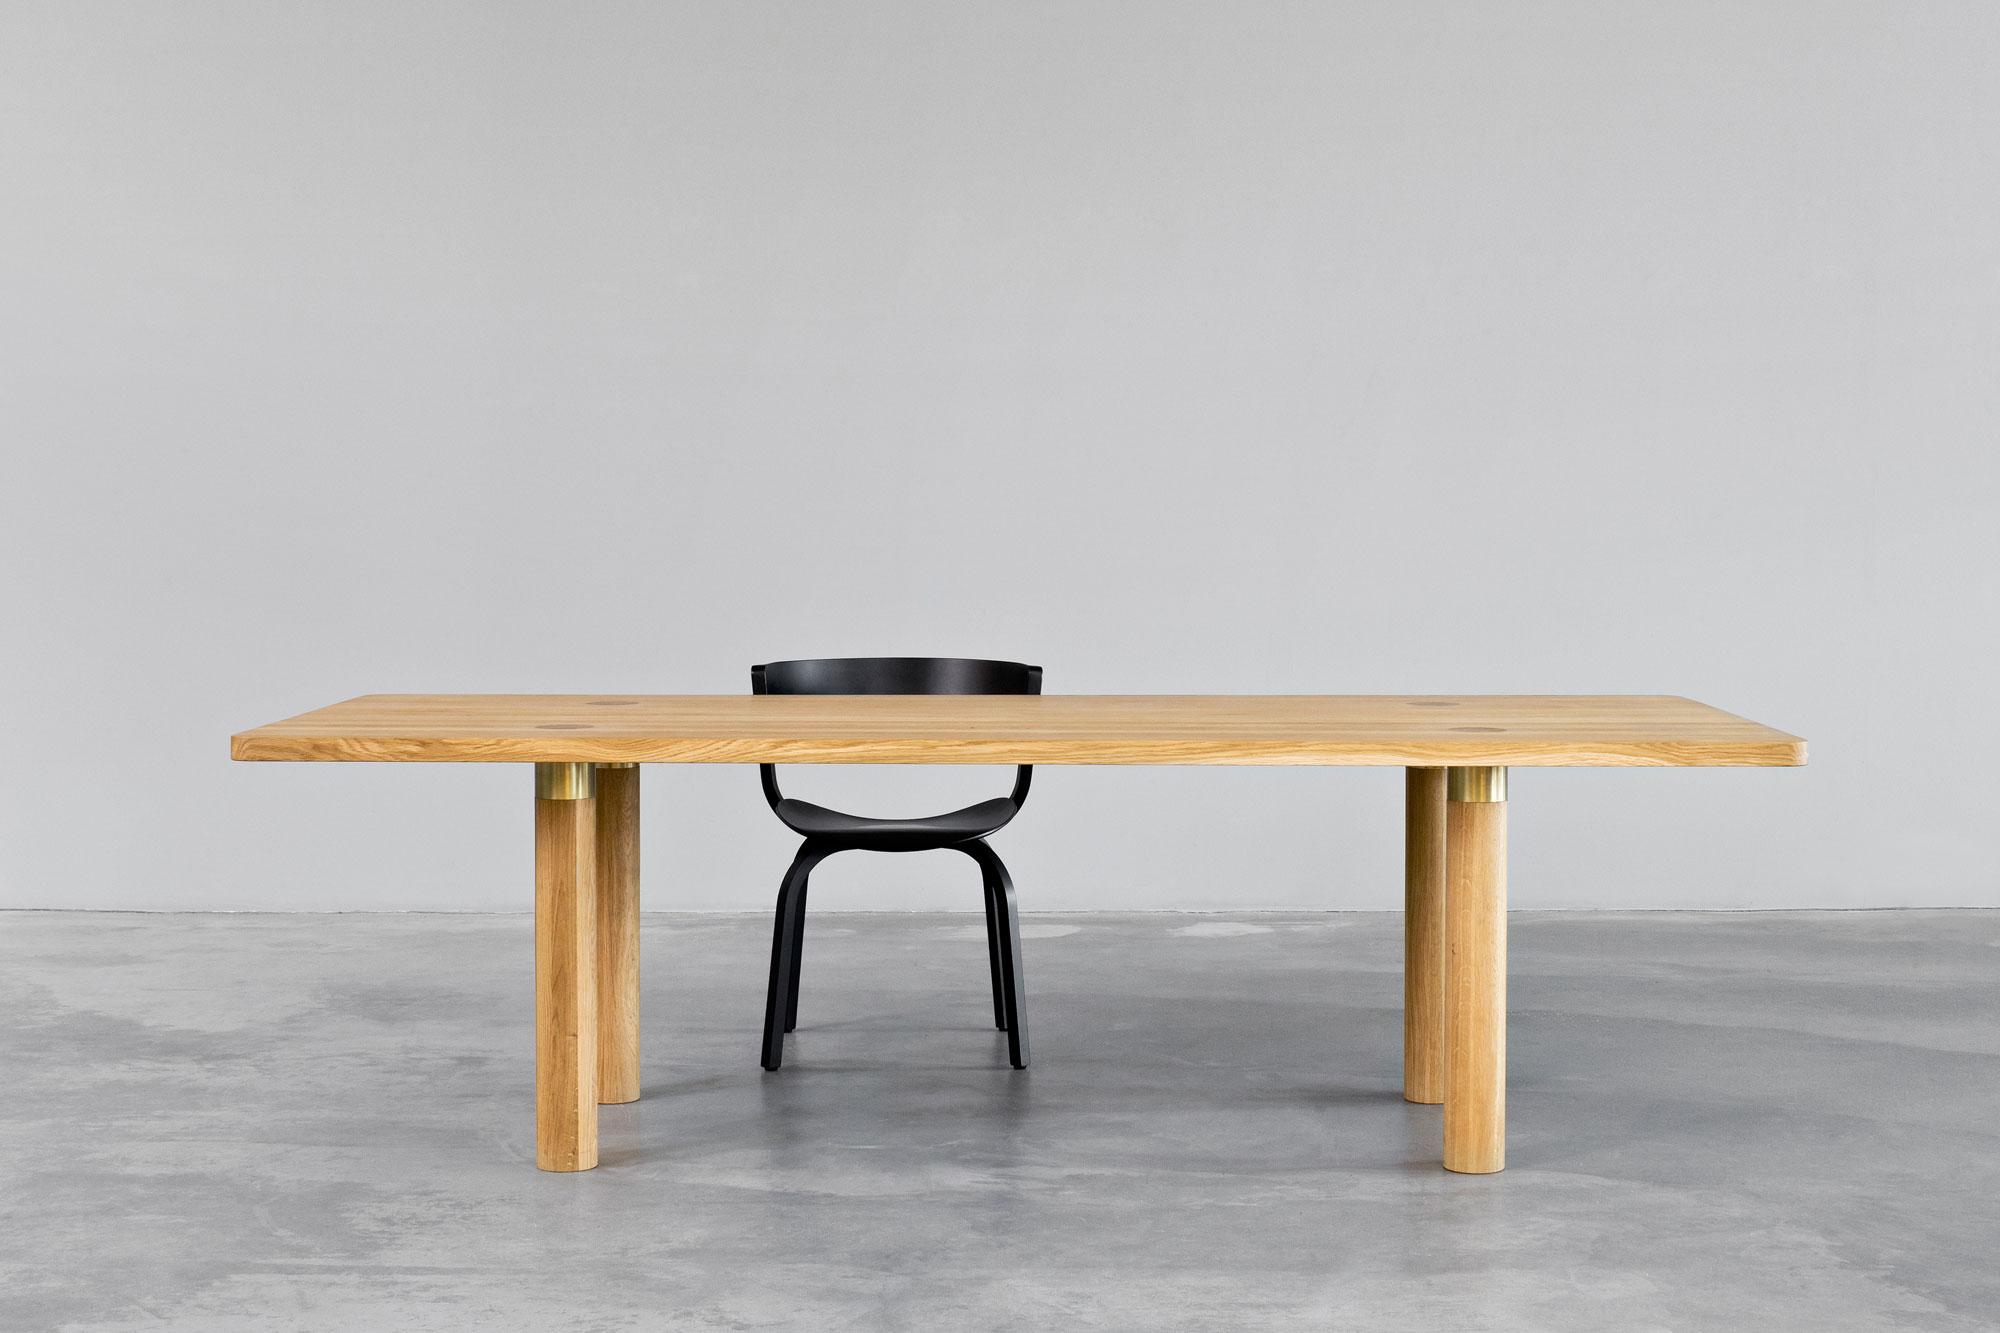 morgen-kollektion-pole-table-1